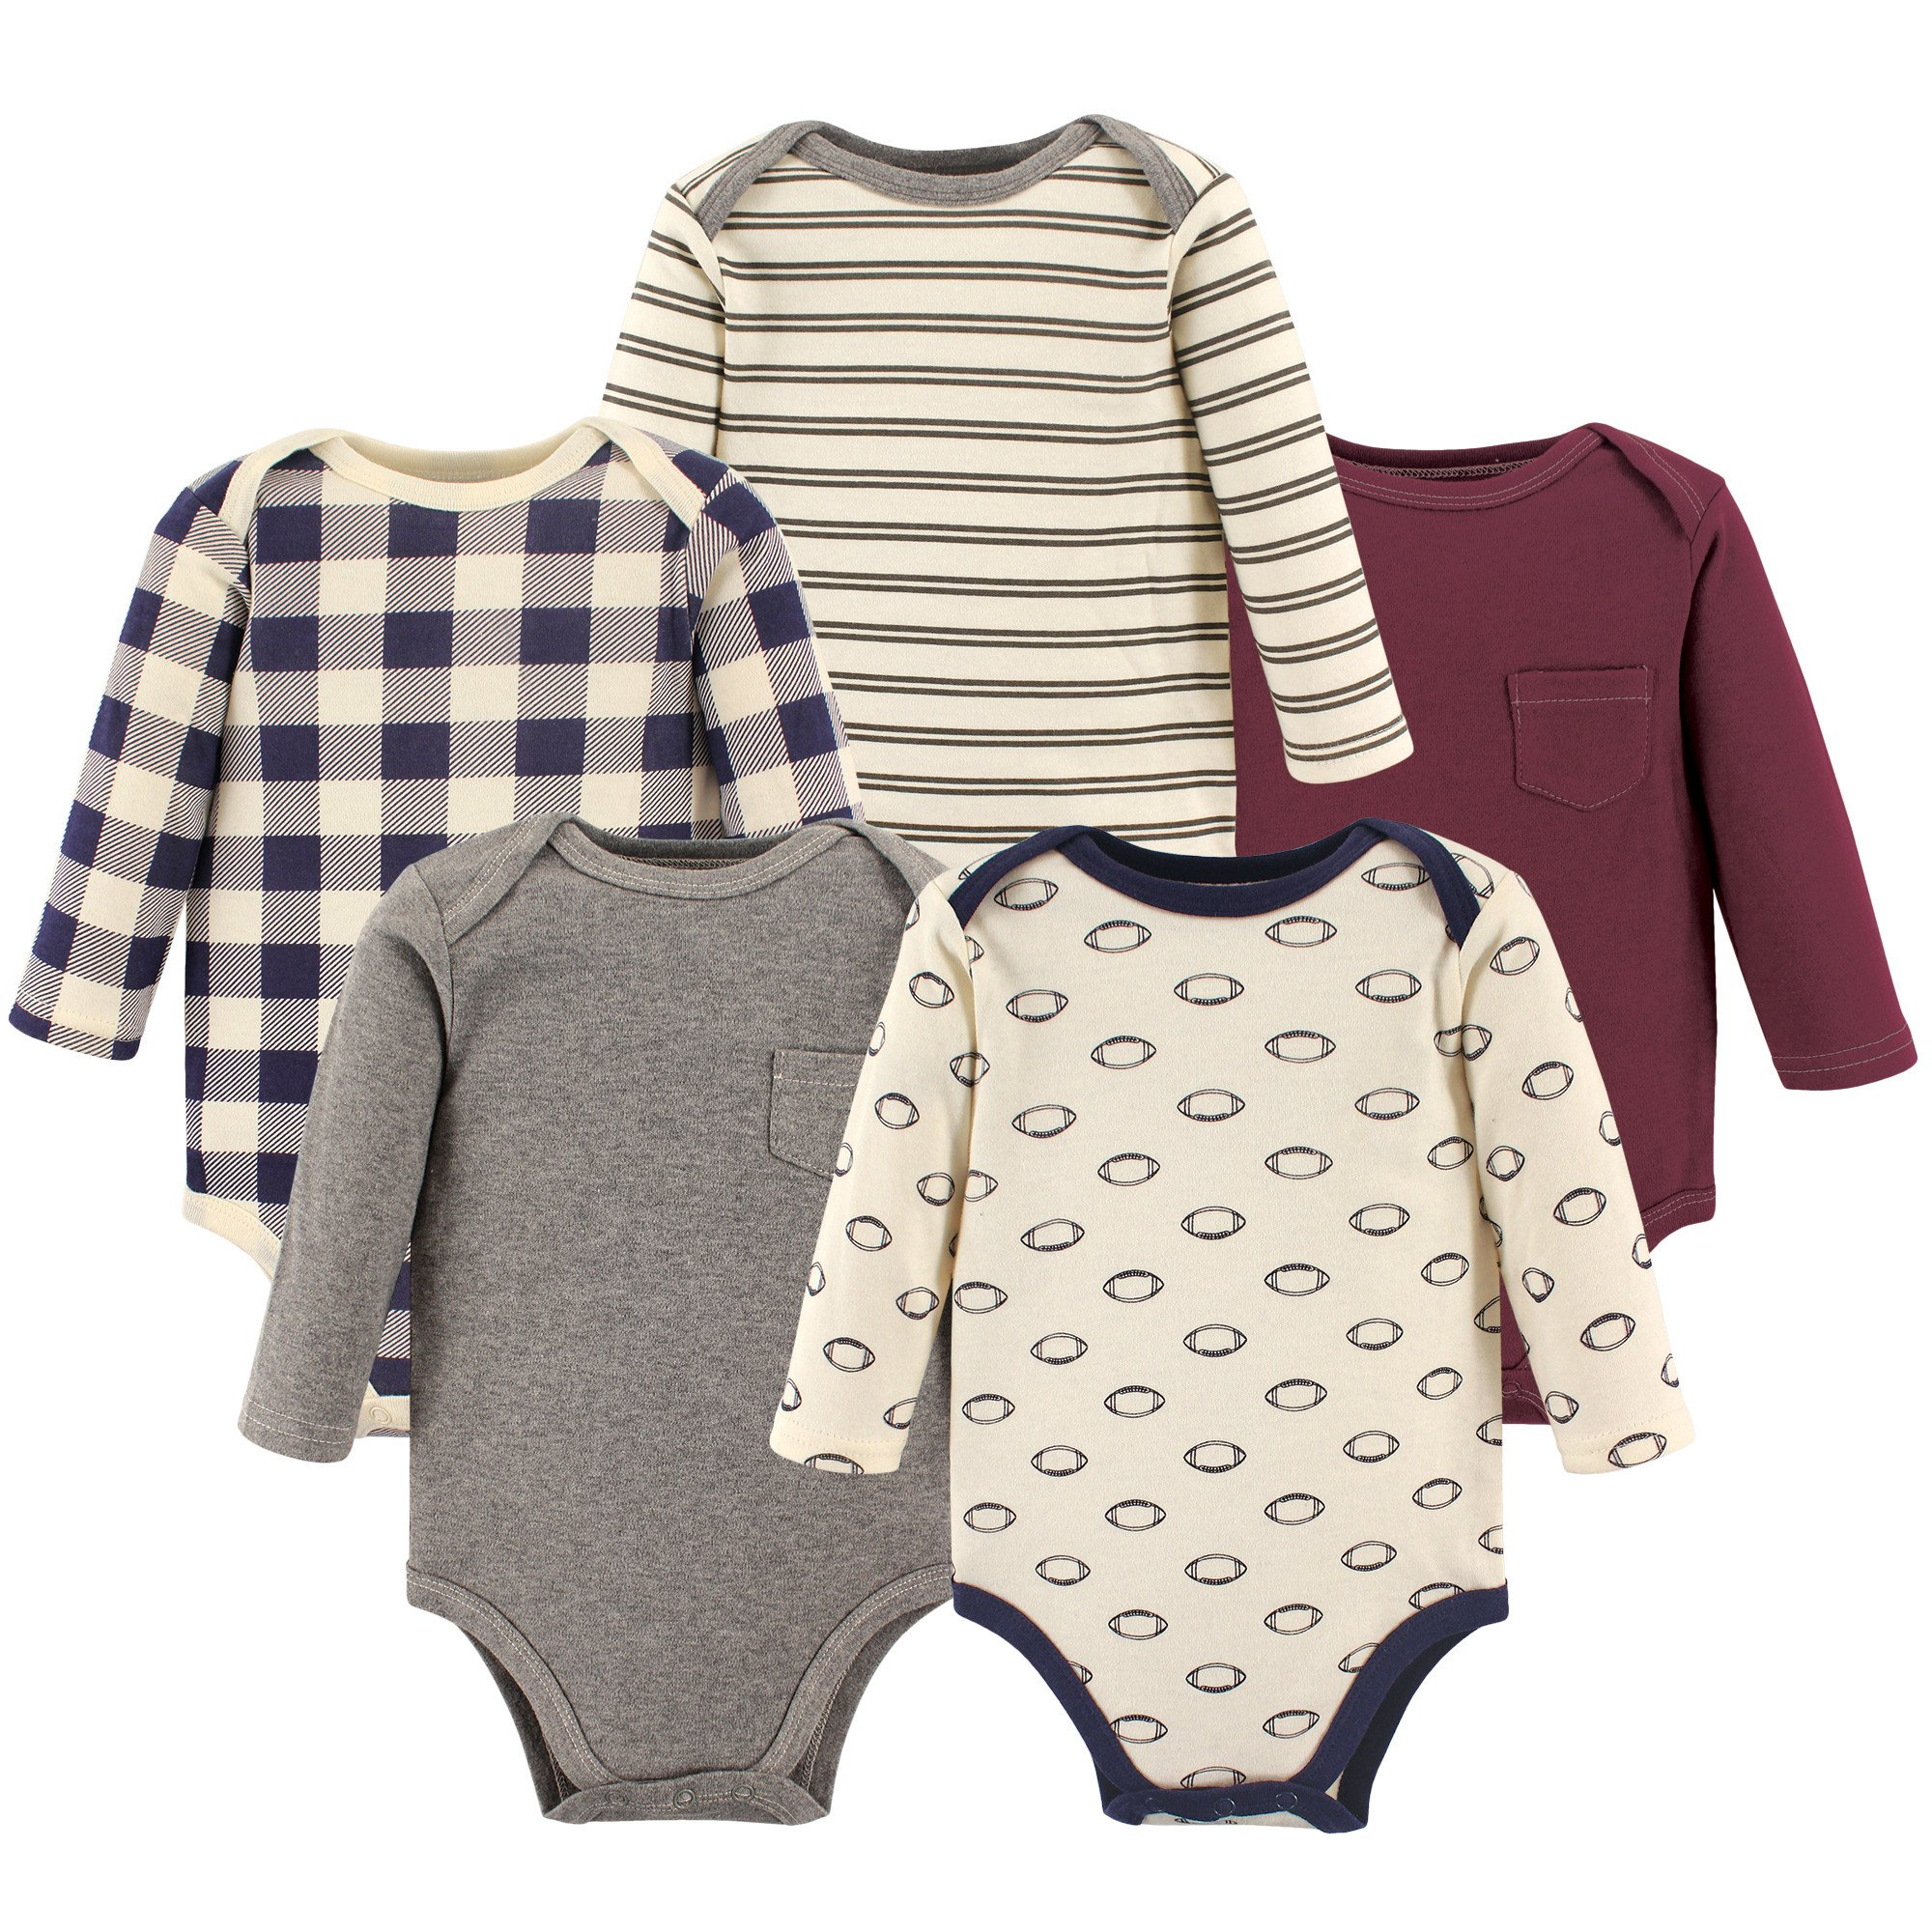 Hudson Baby Long Sleeve Bodysuit 5 Pack, Football, 0-3 Months (3M)